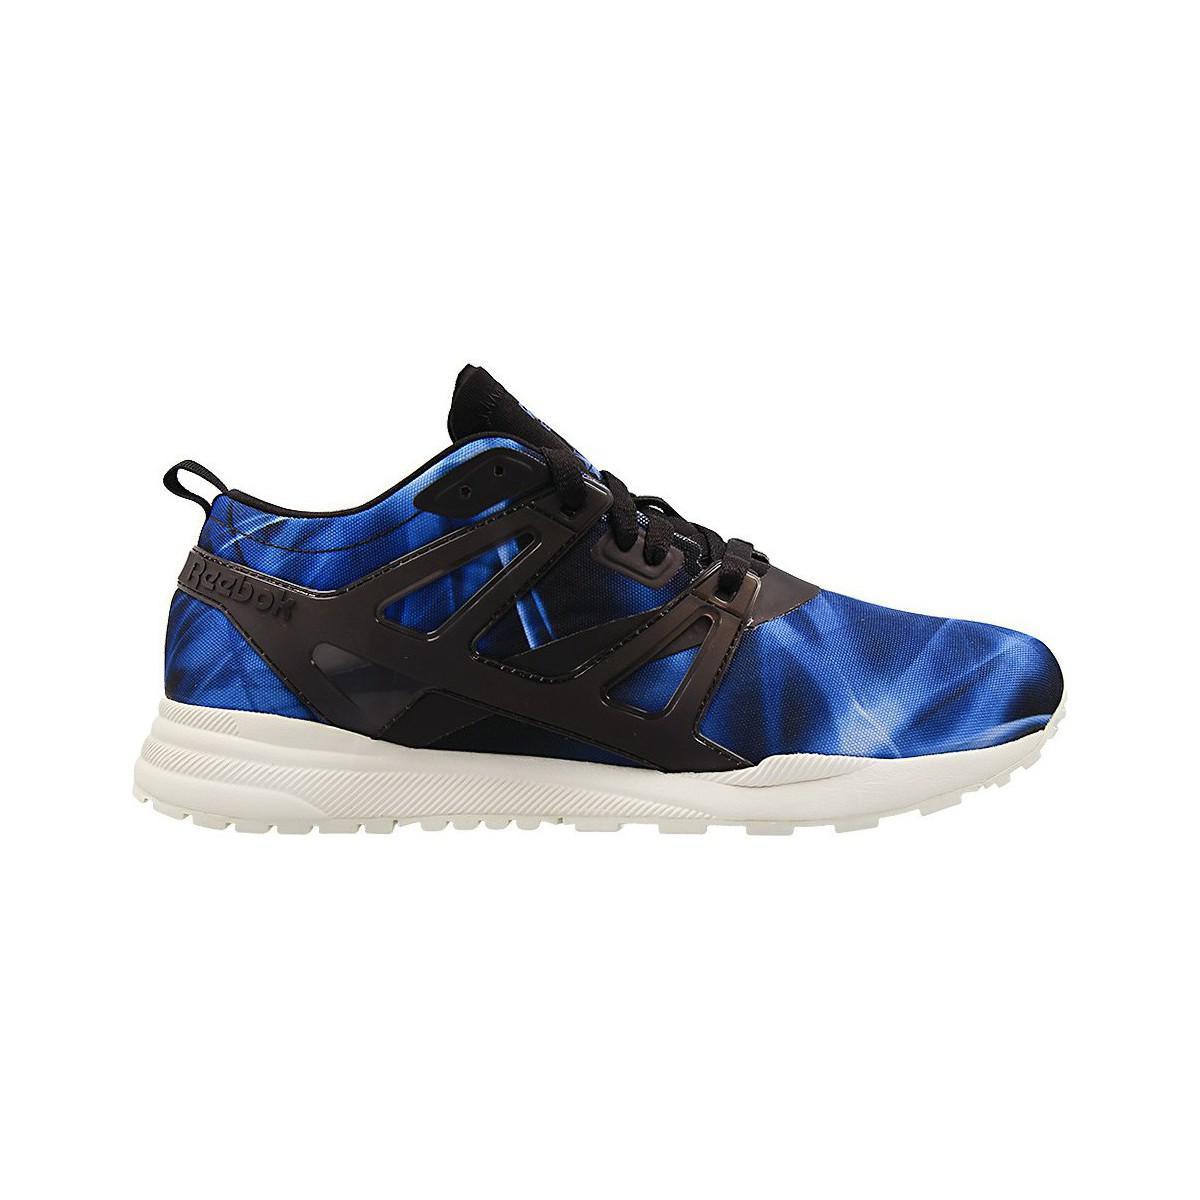 Reebok Ventilator Adapt Gr Blackblue Sportcha Men s Shoes (trainers ... 1fd977cc1